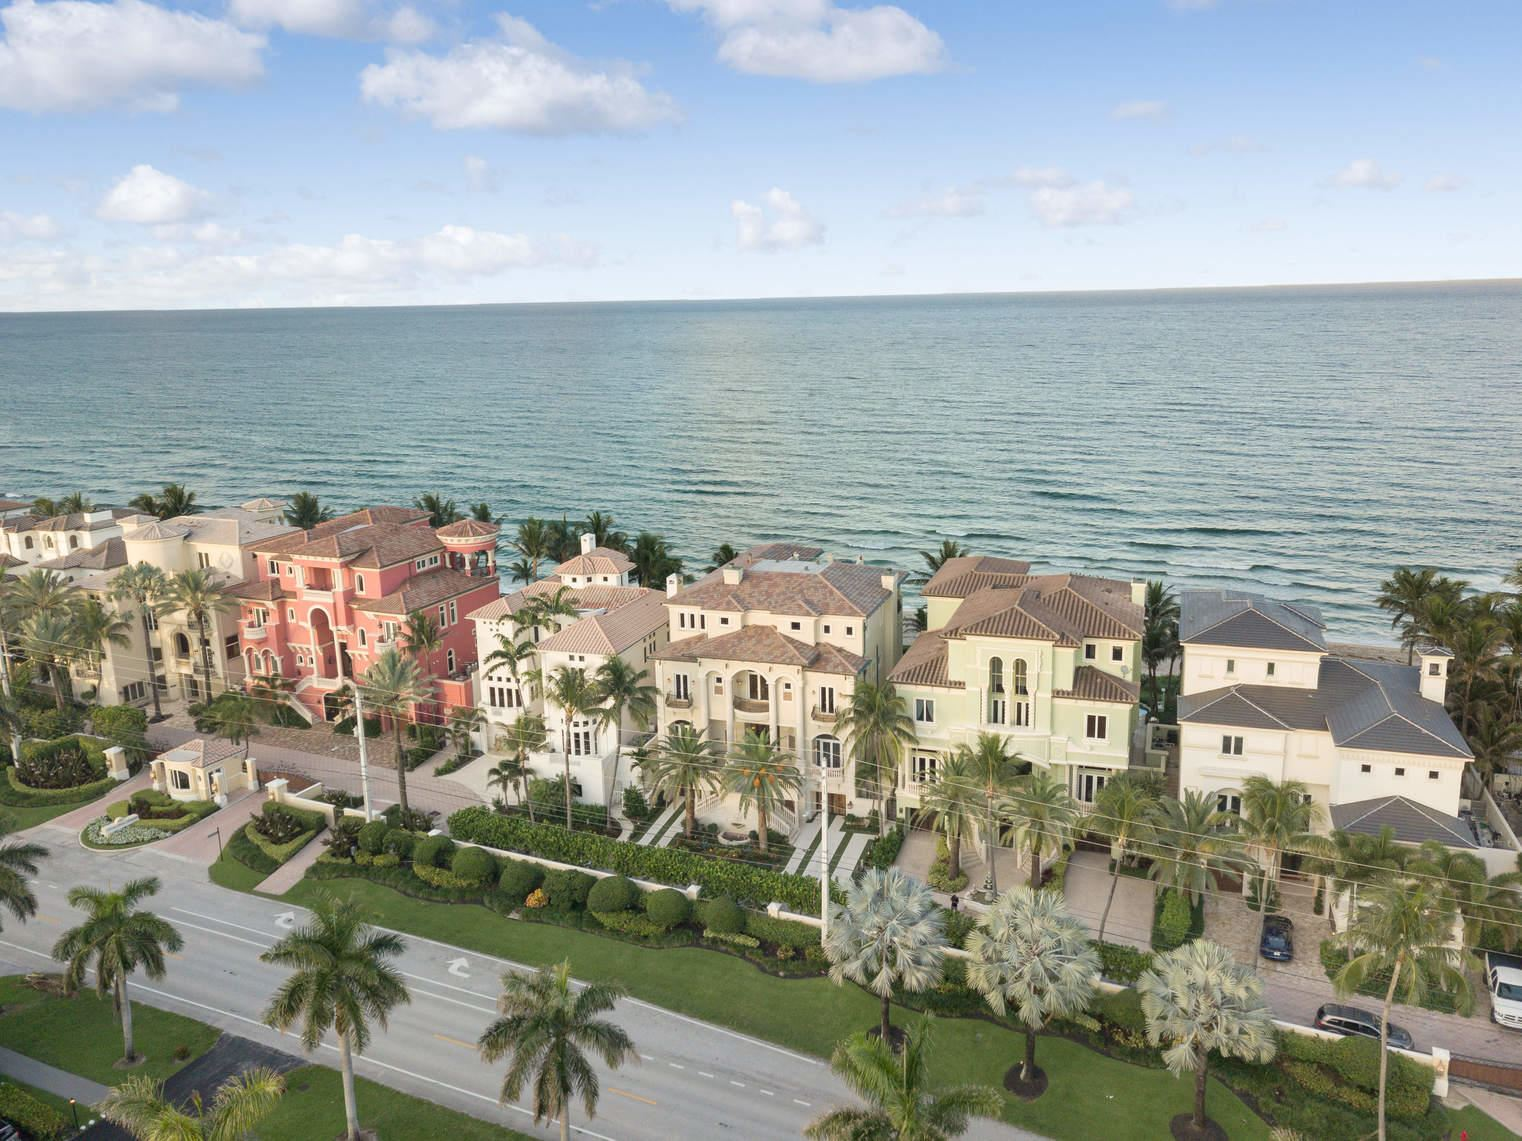 Photo of 8 Ocean Place, Highland Beach, FL 33487 (MLS # RX-10630735)